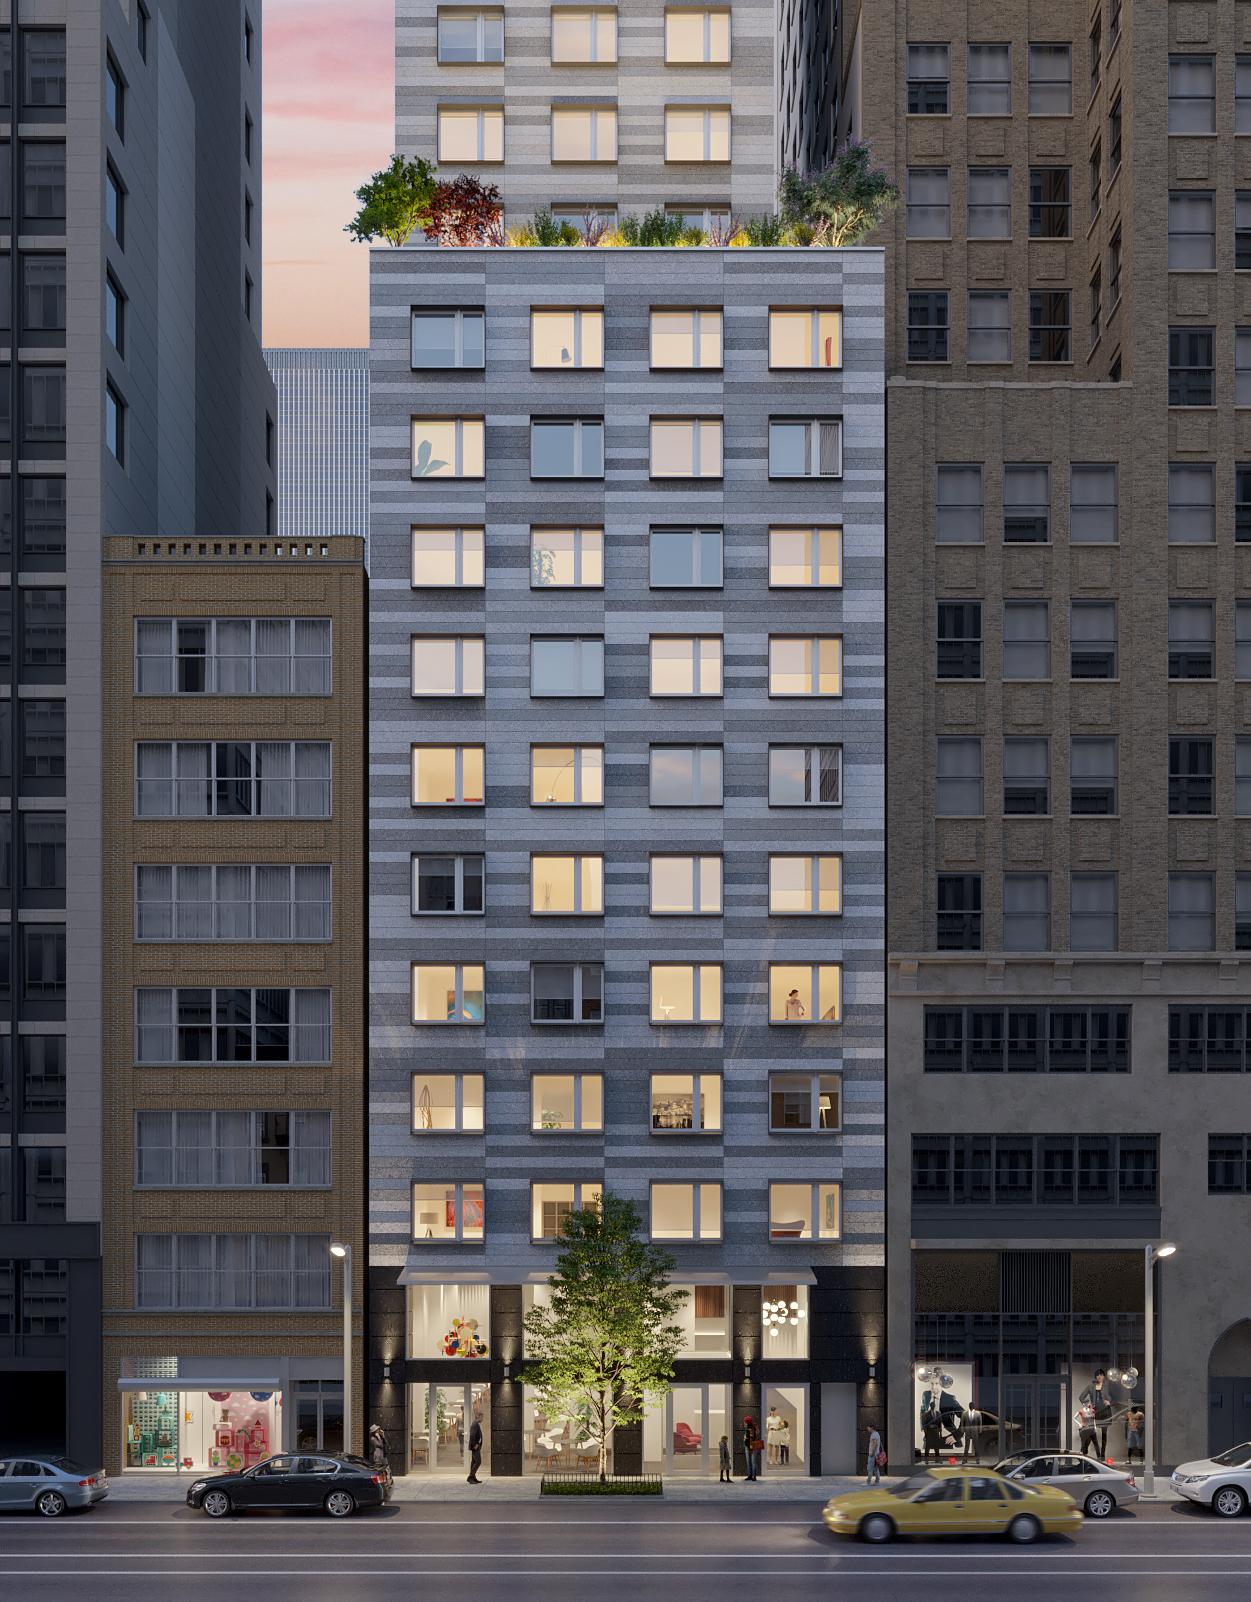 Flow Chelsea, 211 West 29th Street